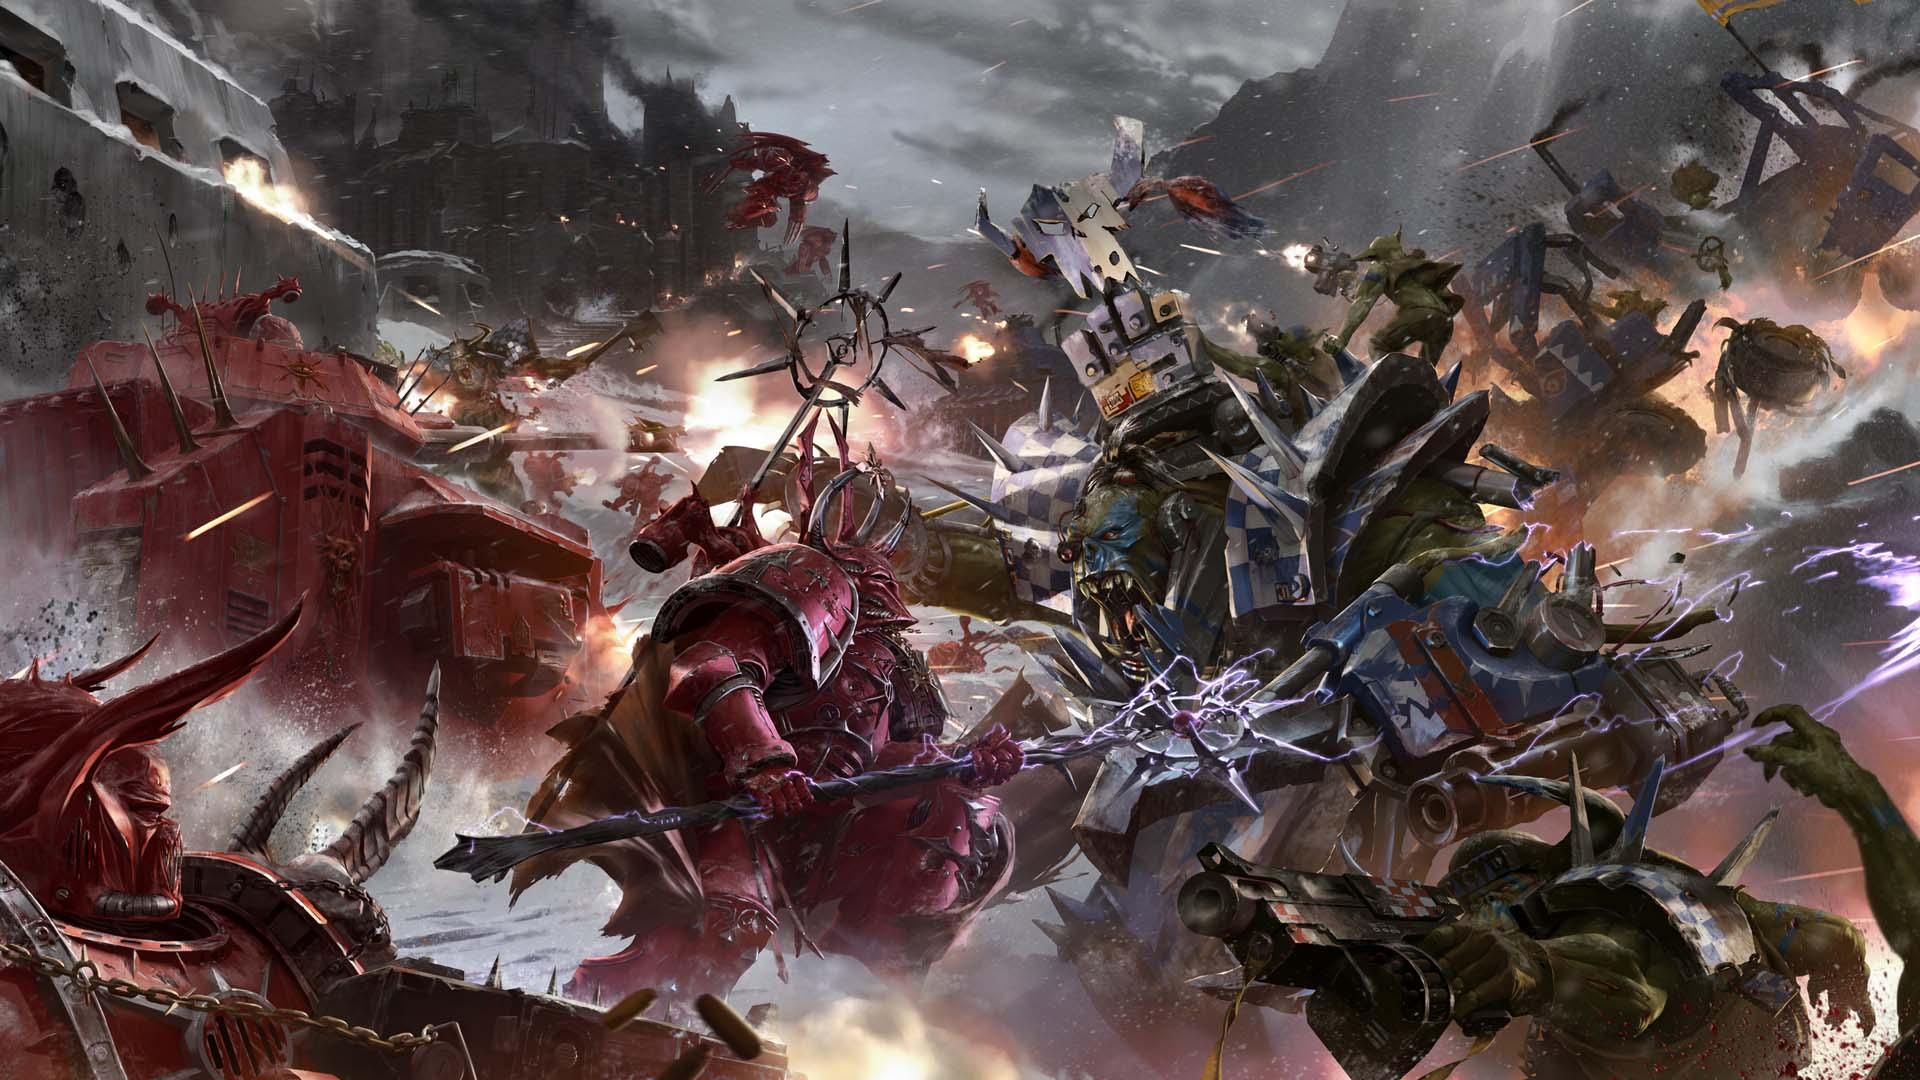 orcs vs chaos space marines. wallpaper from warhammer 40k: eternal